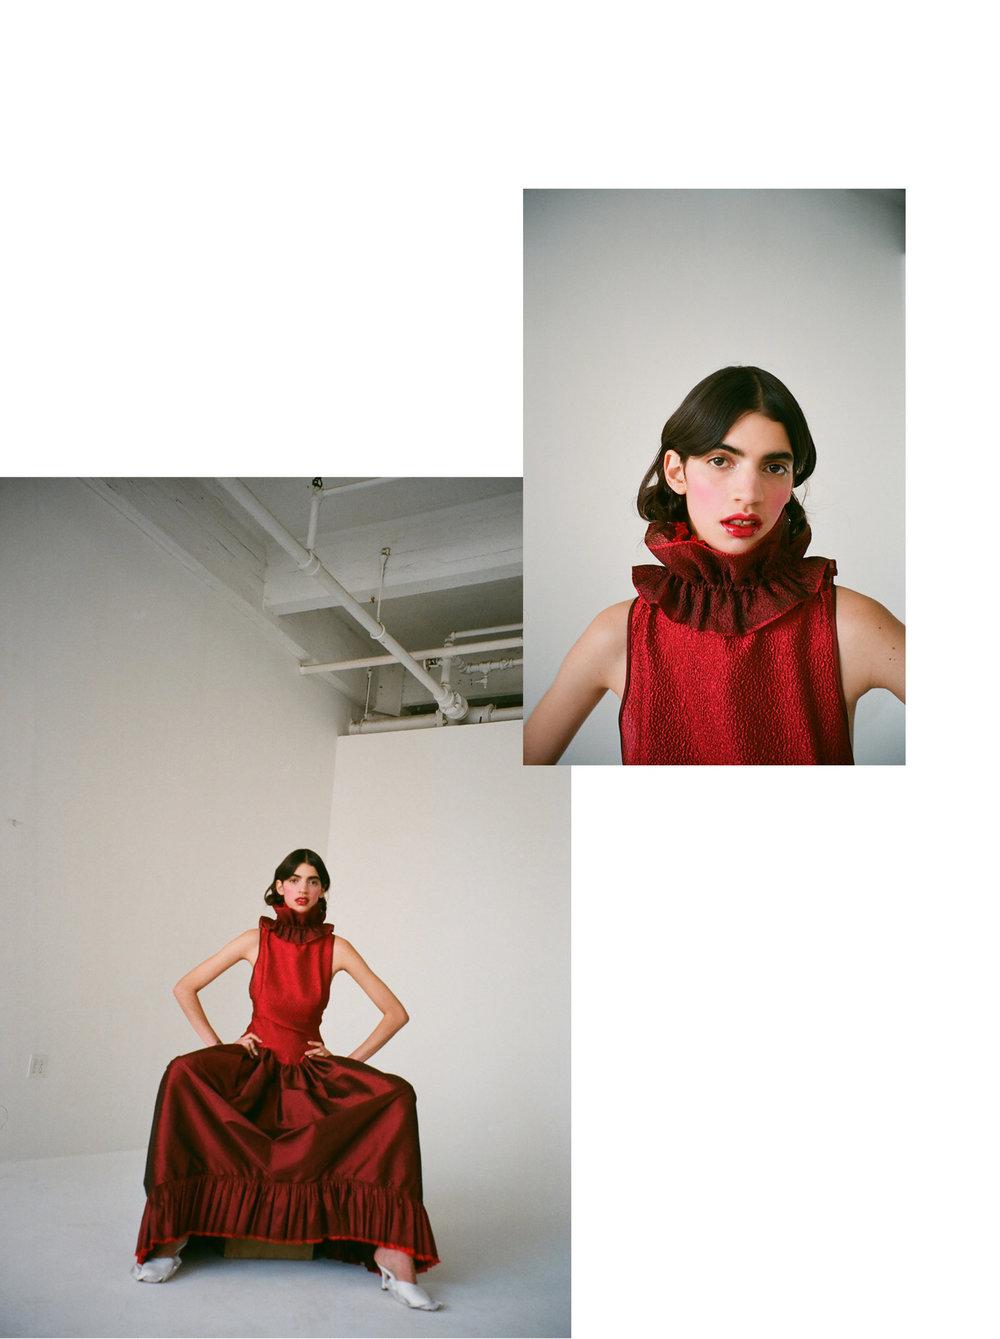 models.com models dot com kelsey randall